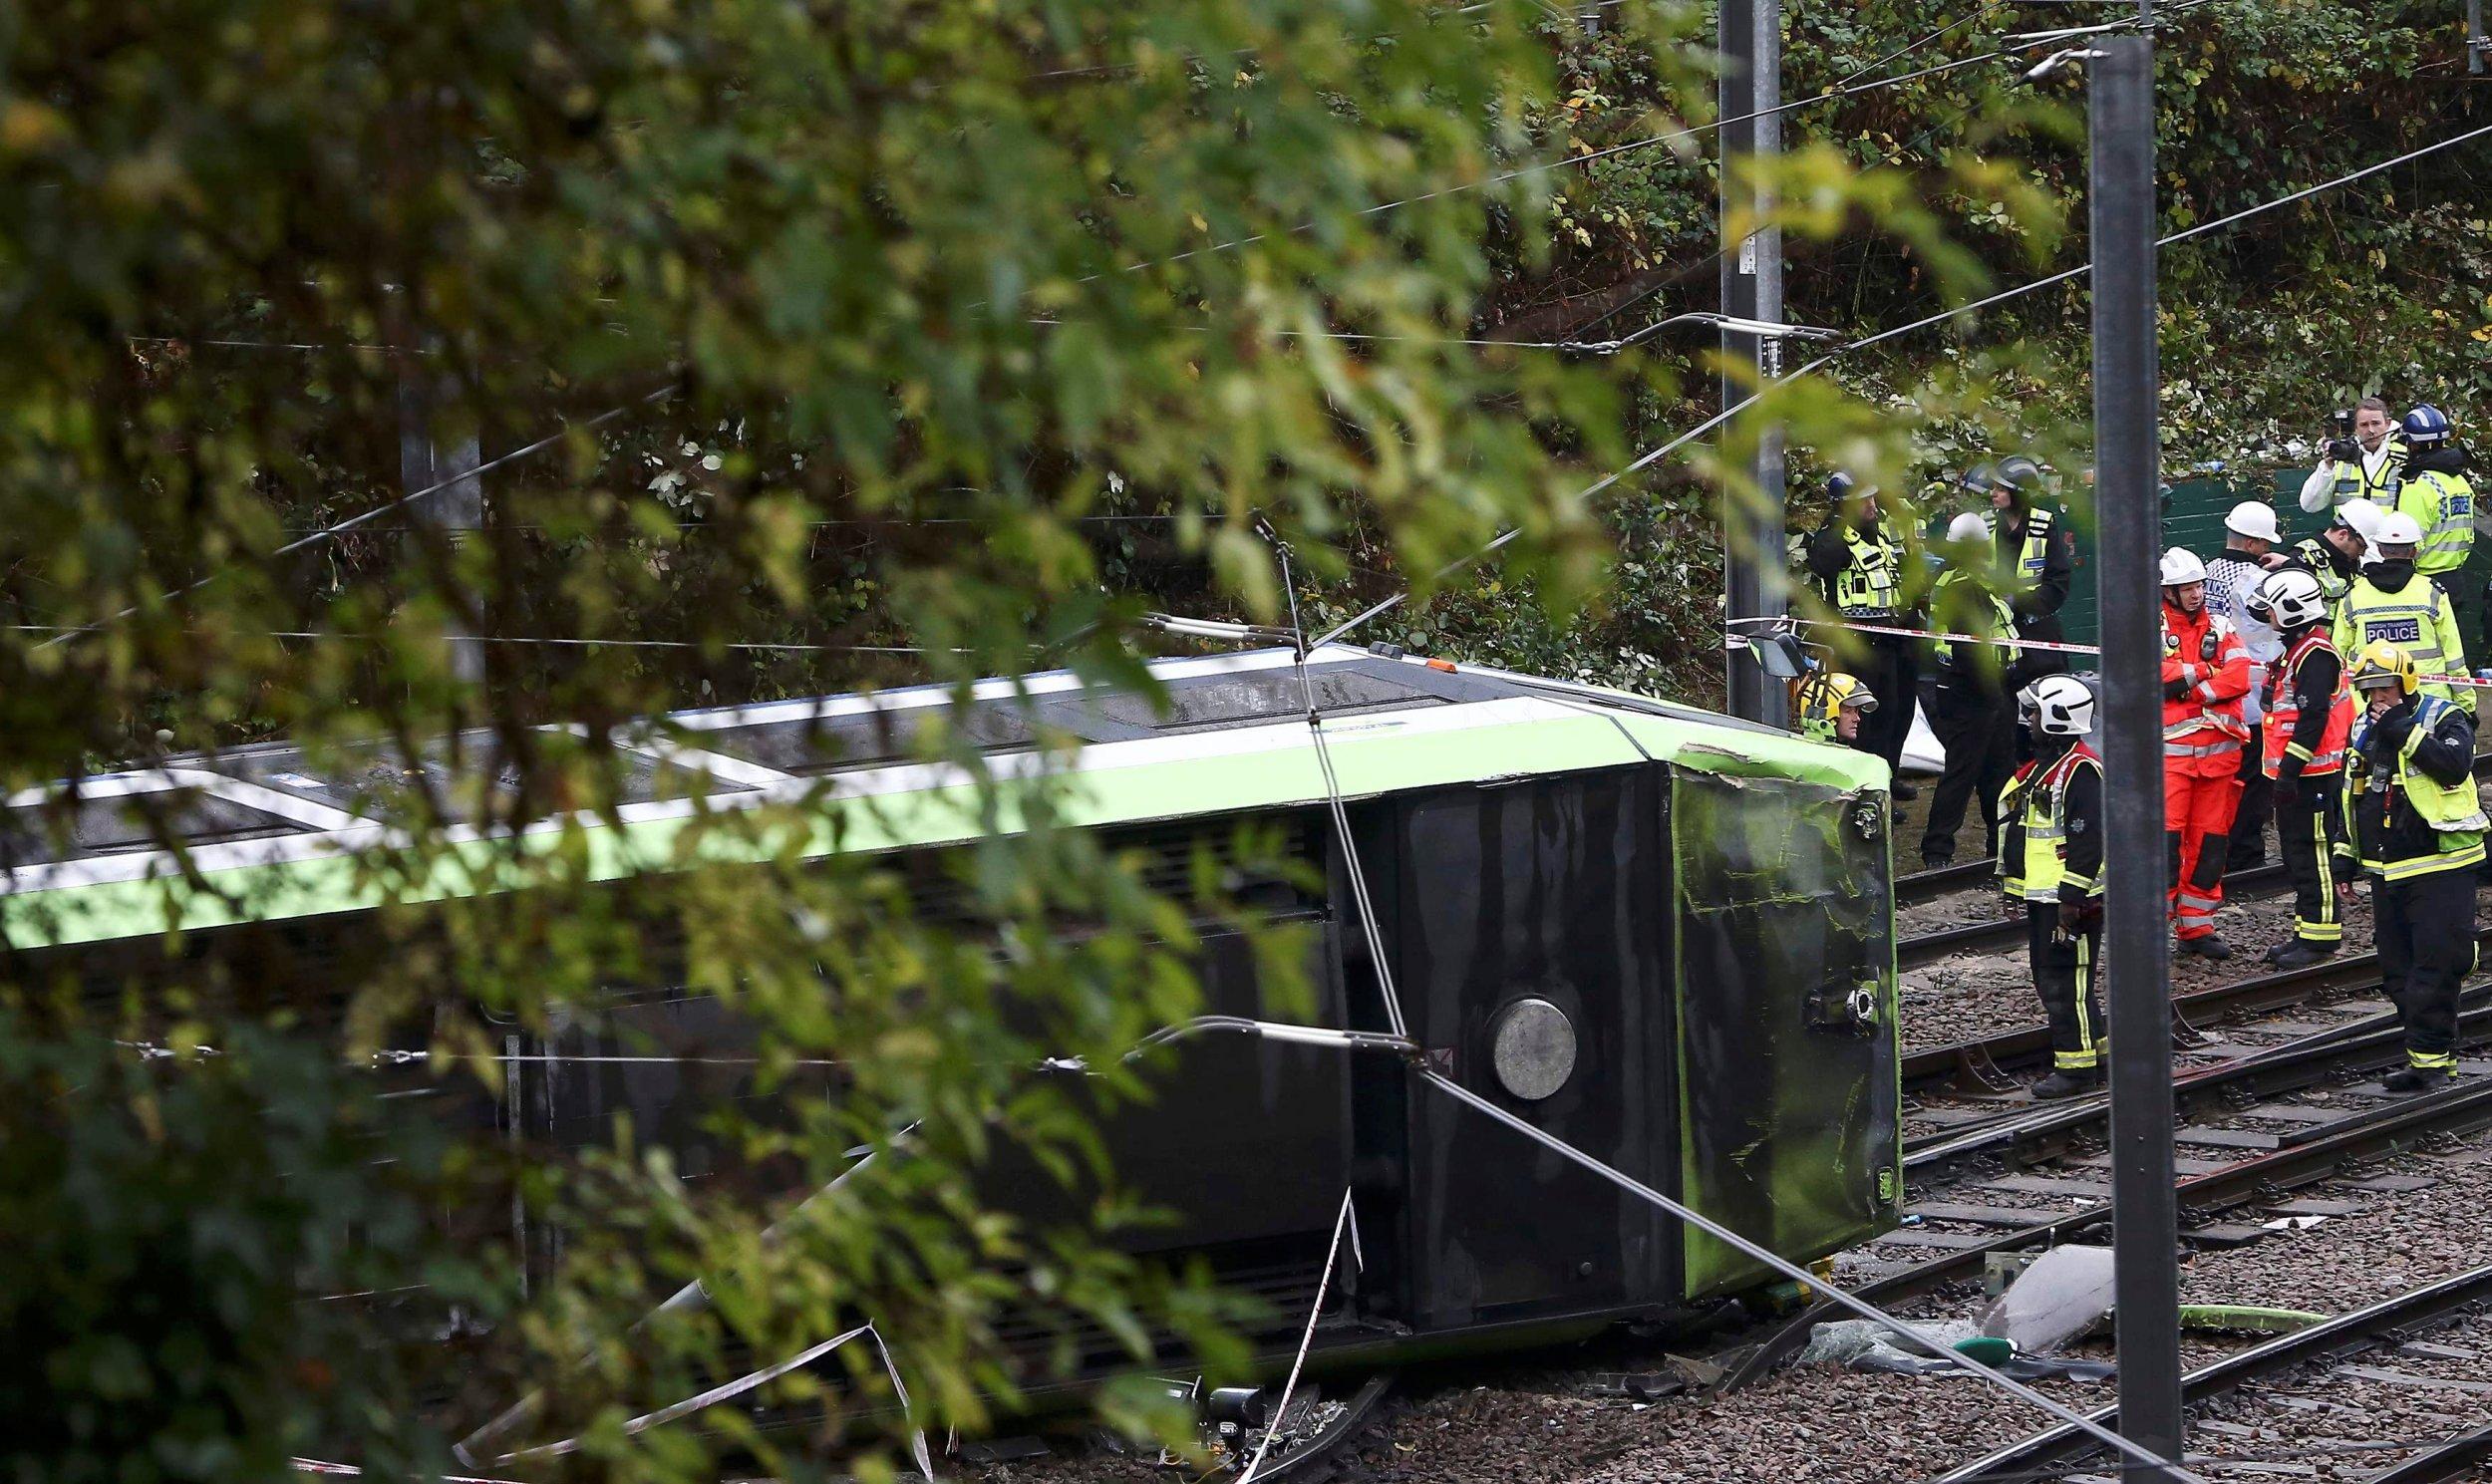 Tram Overturns in London